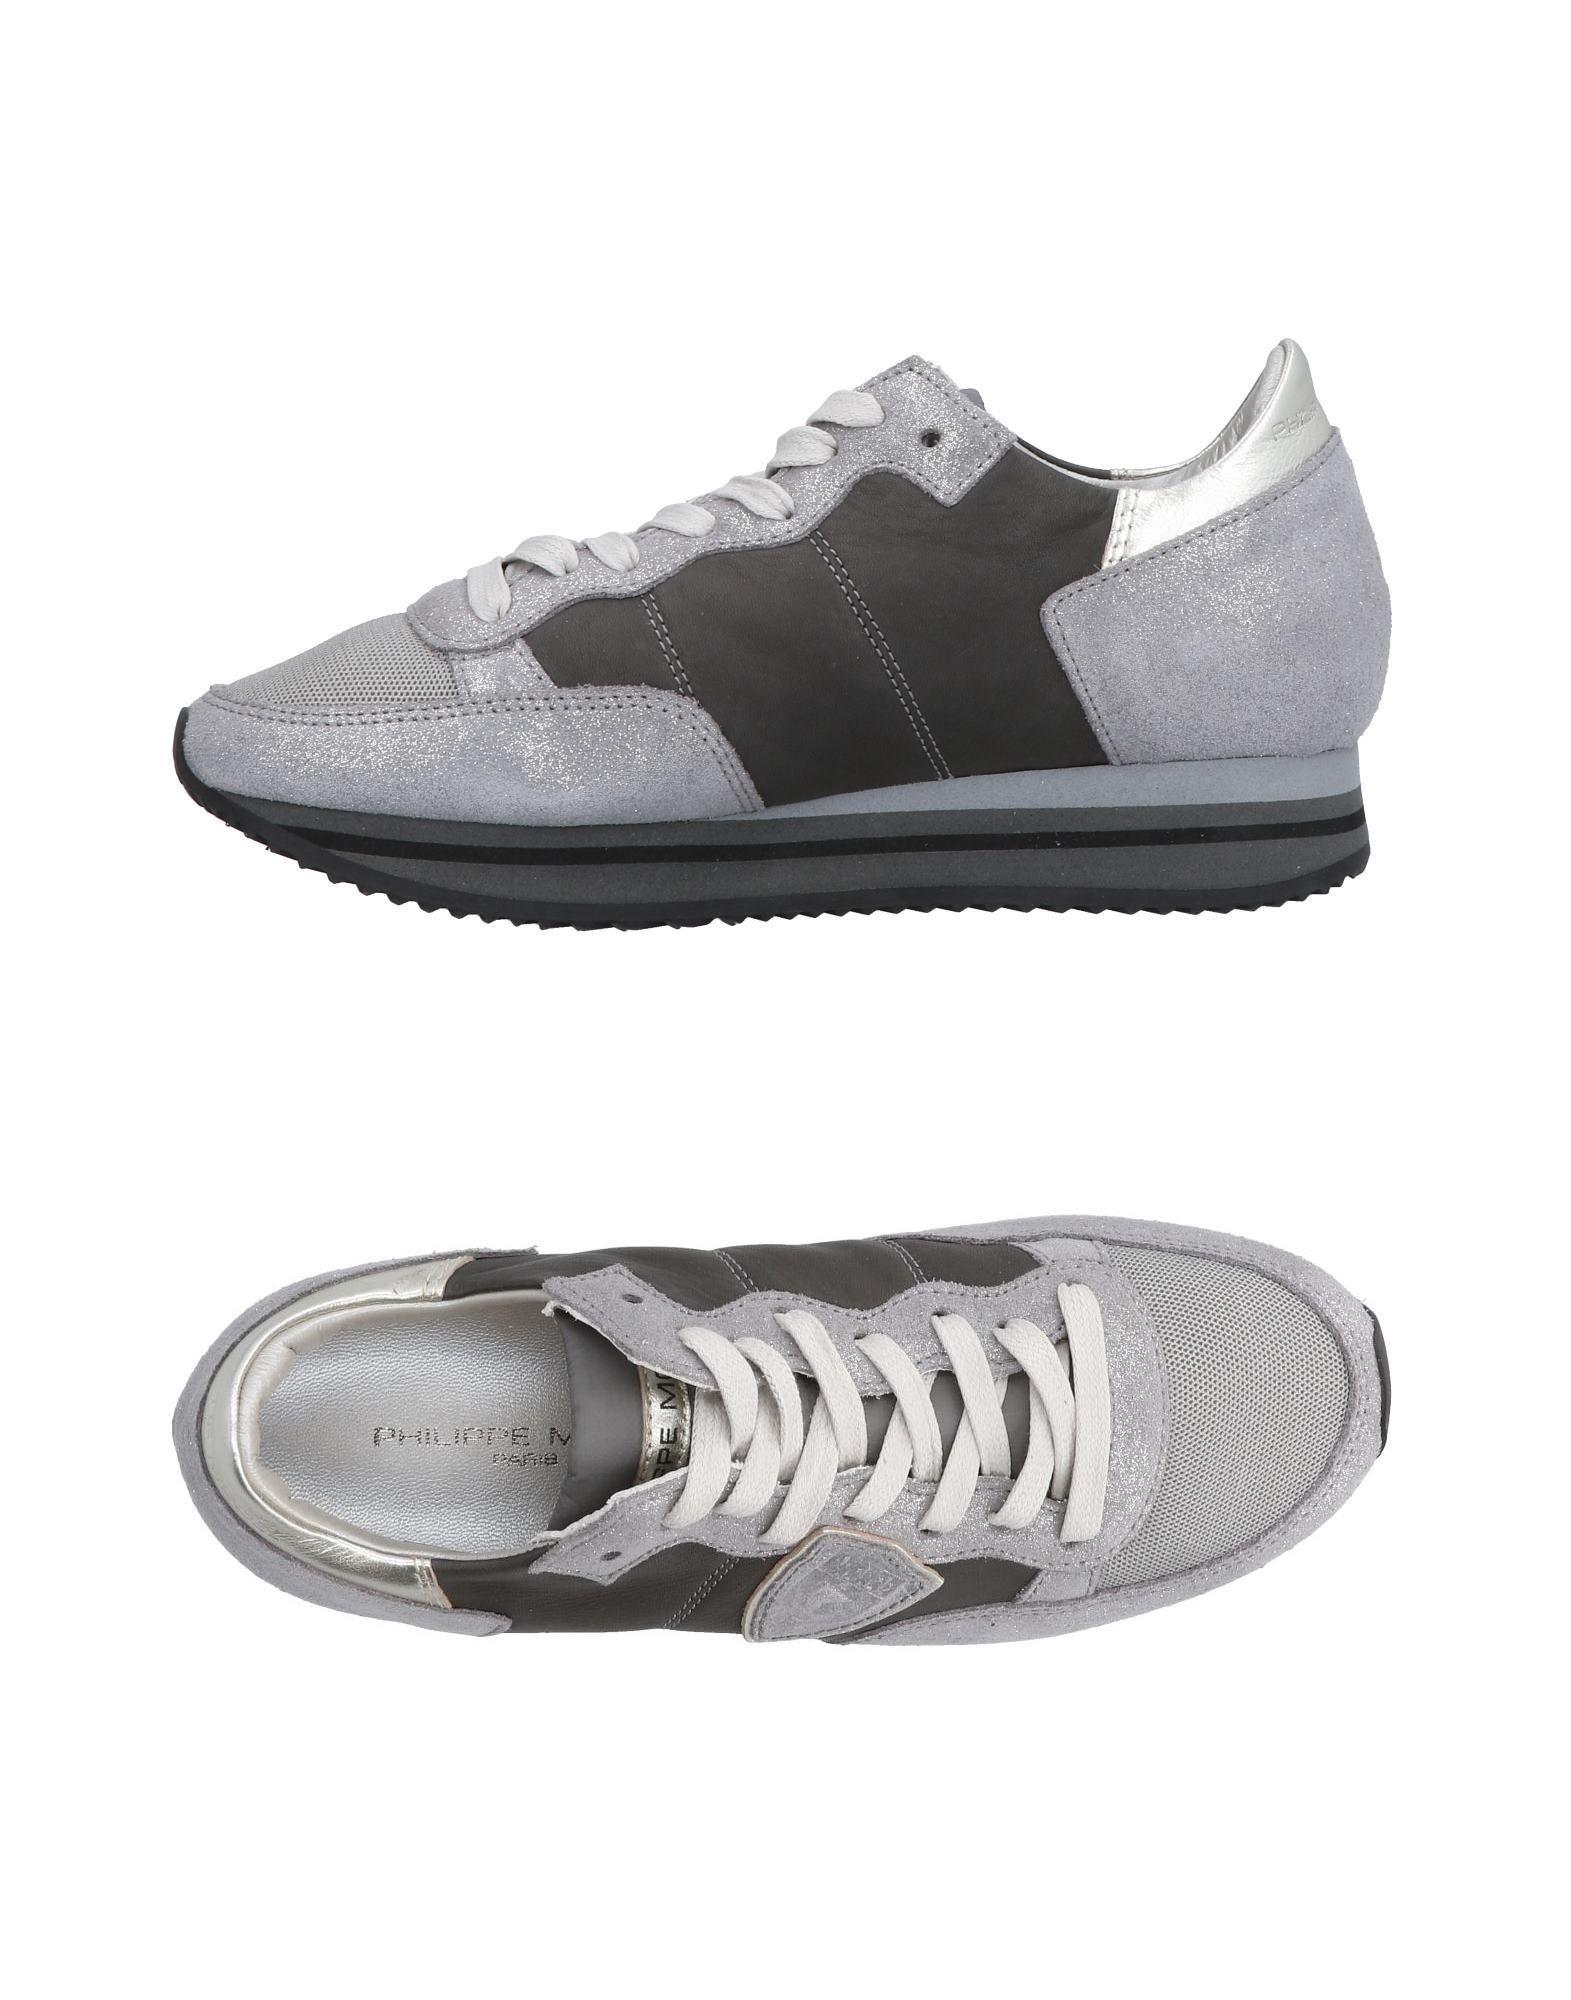 Philippe Model Sneakers In Grey